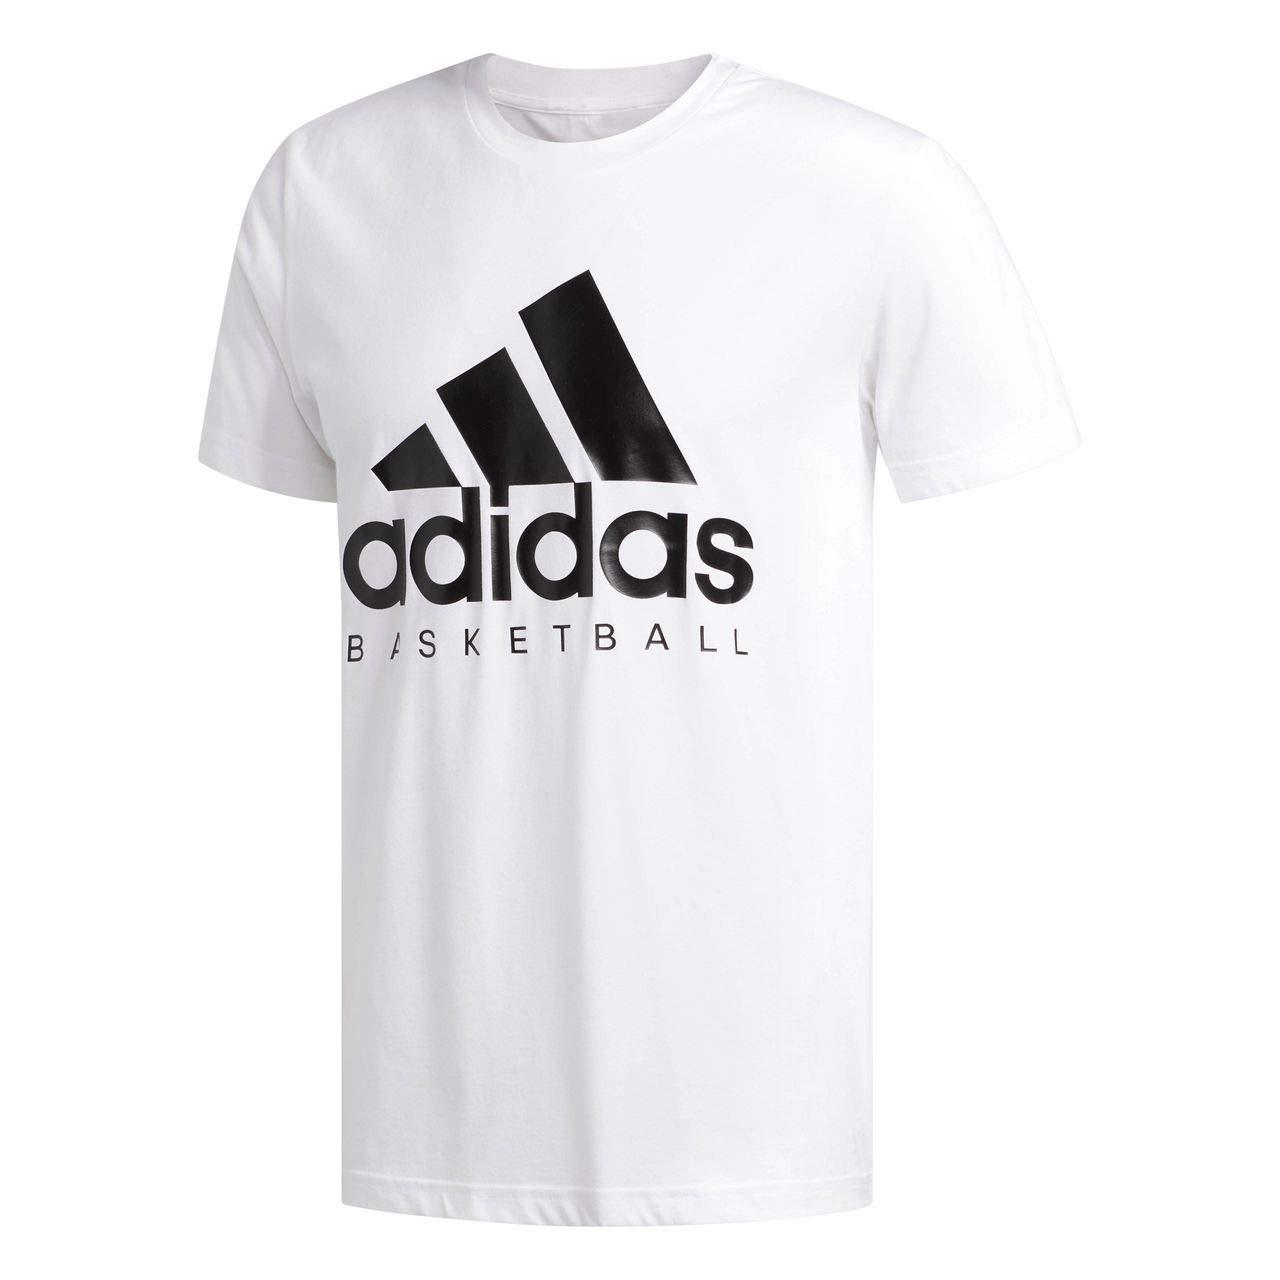 Adidas - Maglietta a Maniche Corte da Basket da Uomo